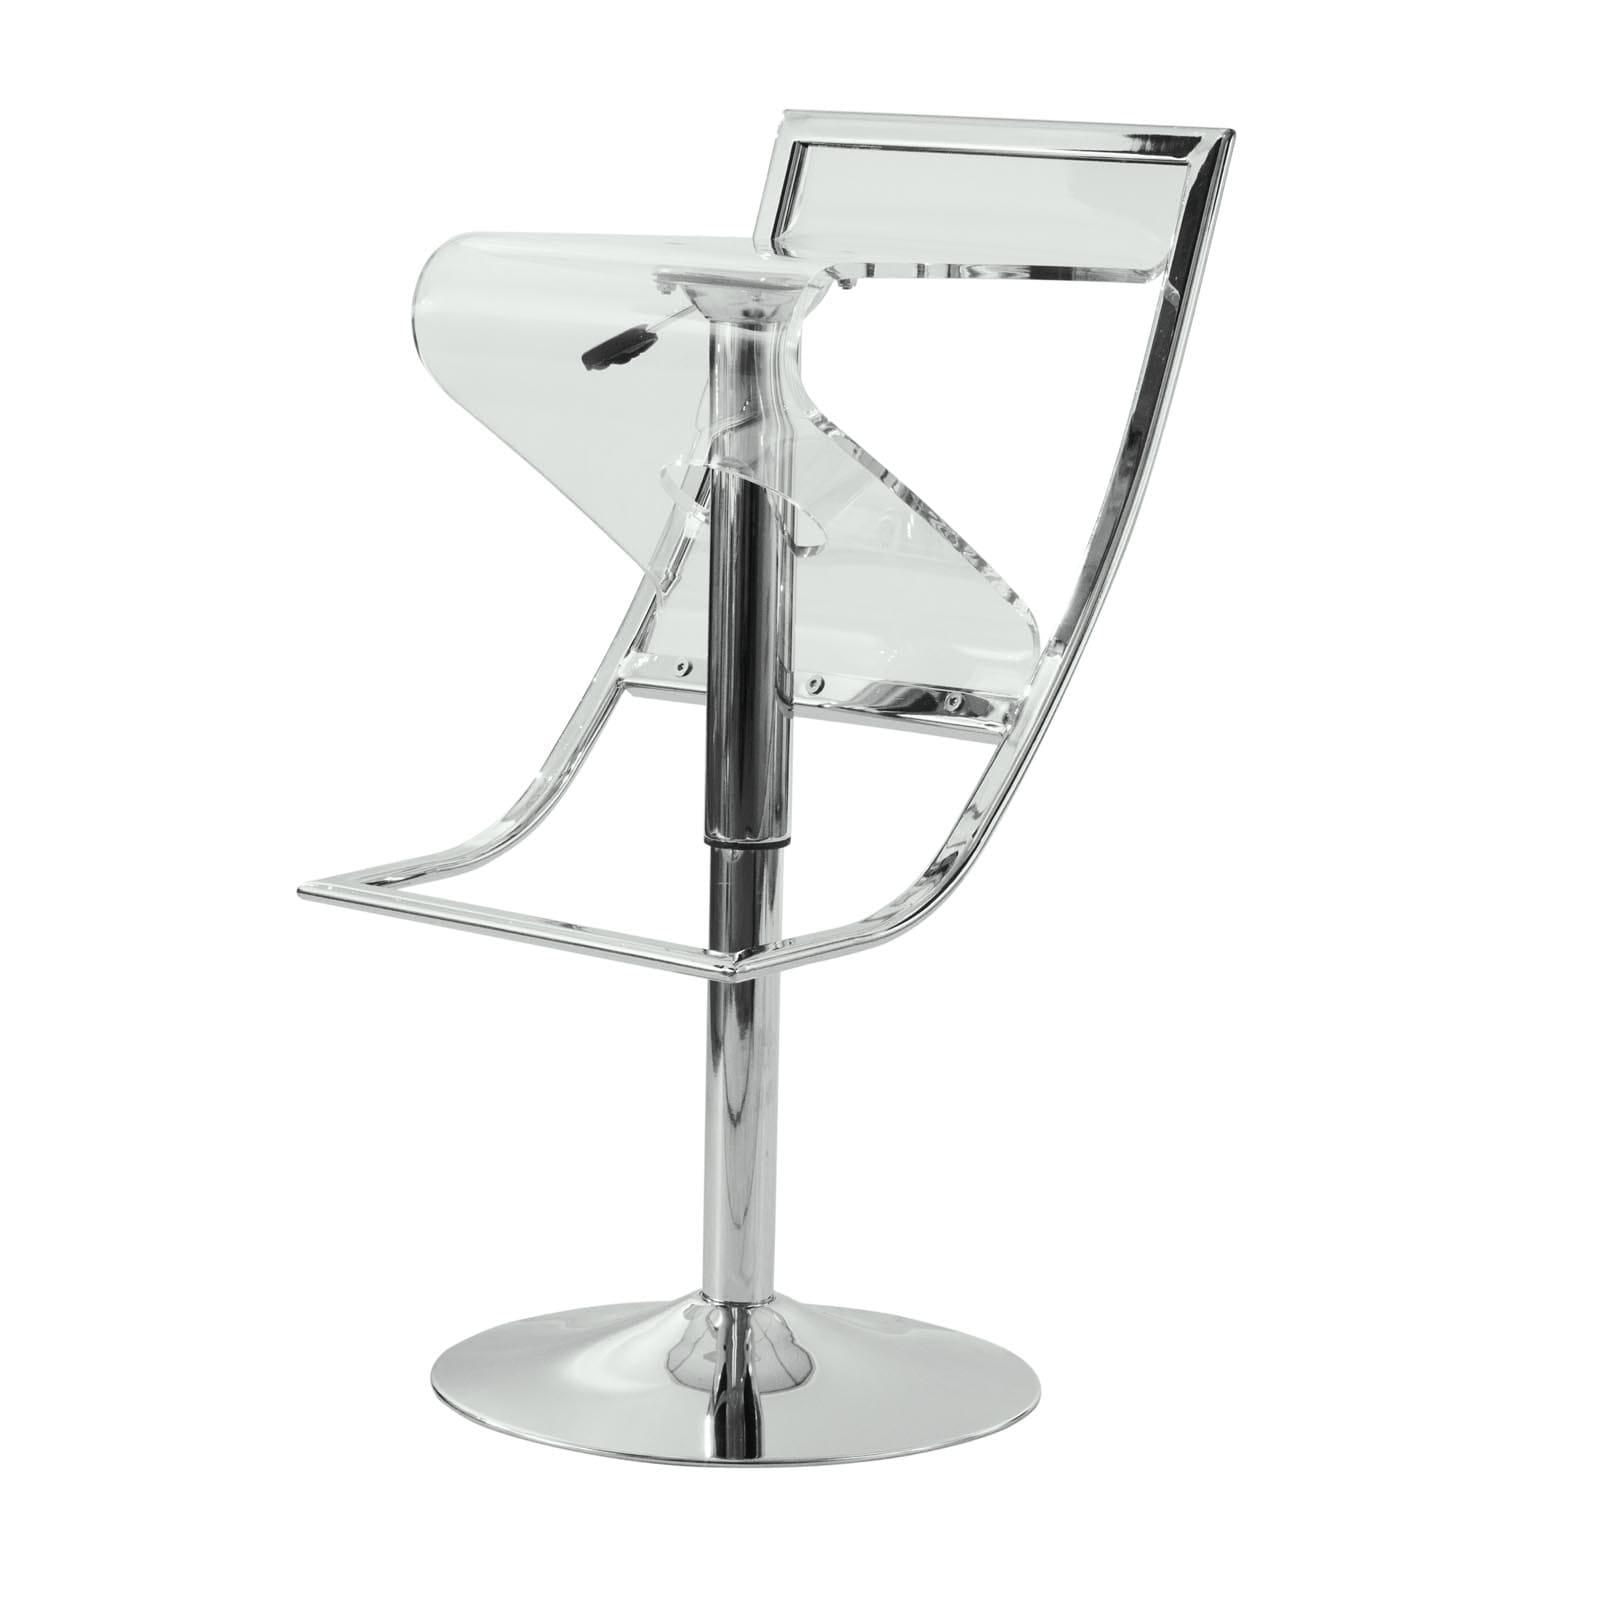 LeisureMod Clifton Clear Acrylic Adjustable Bar Counter Stool   N/A